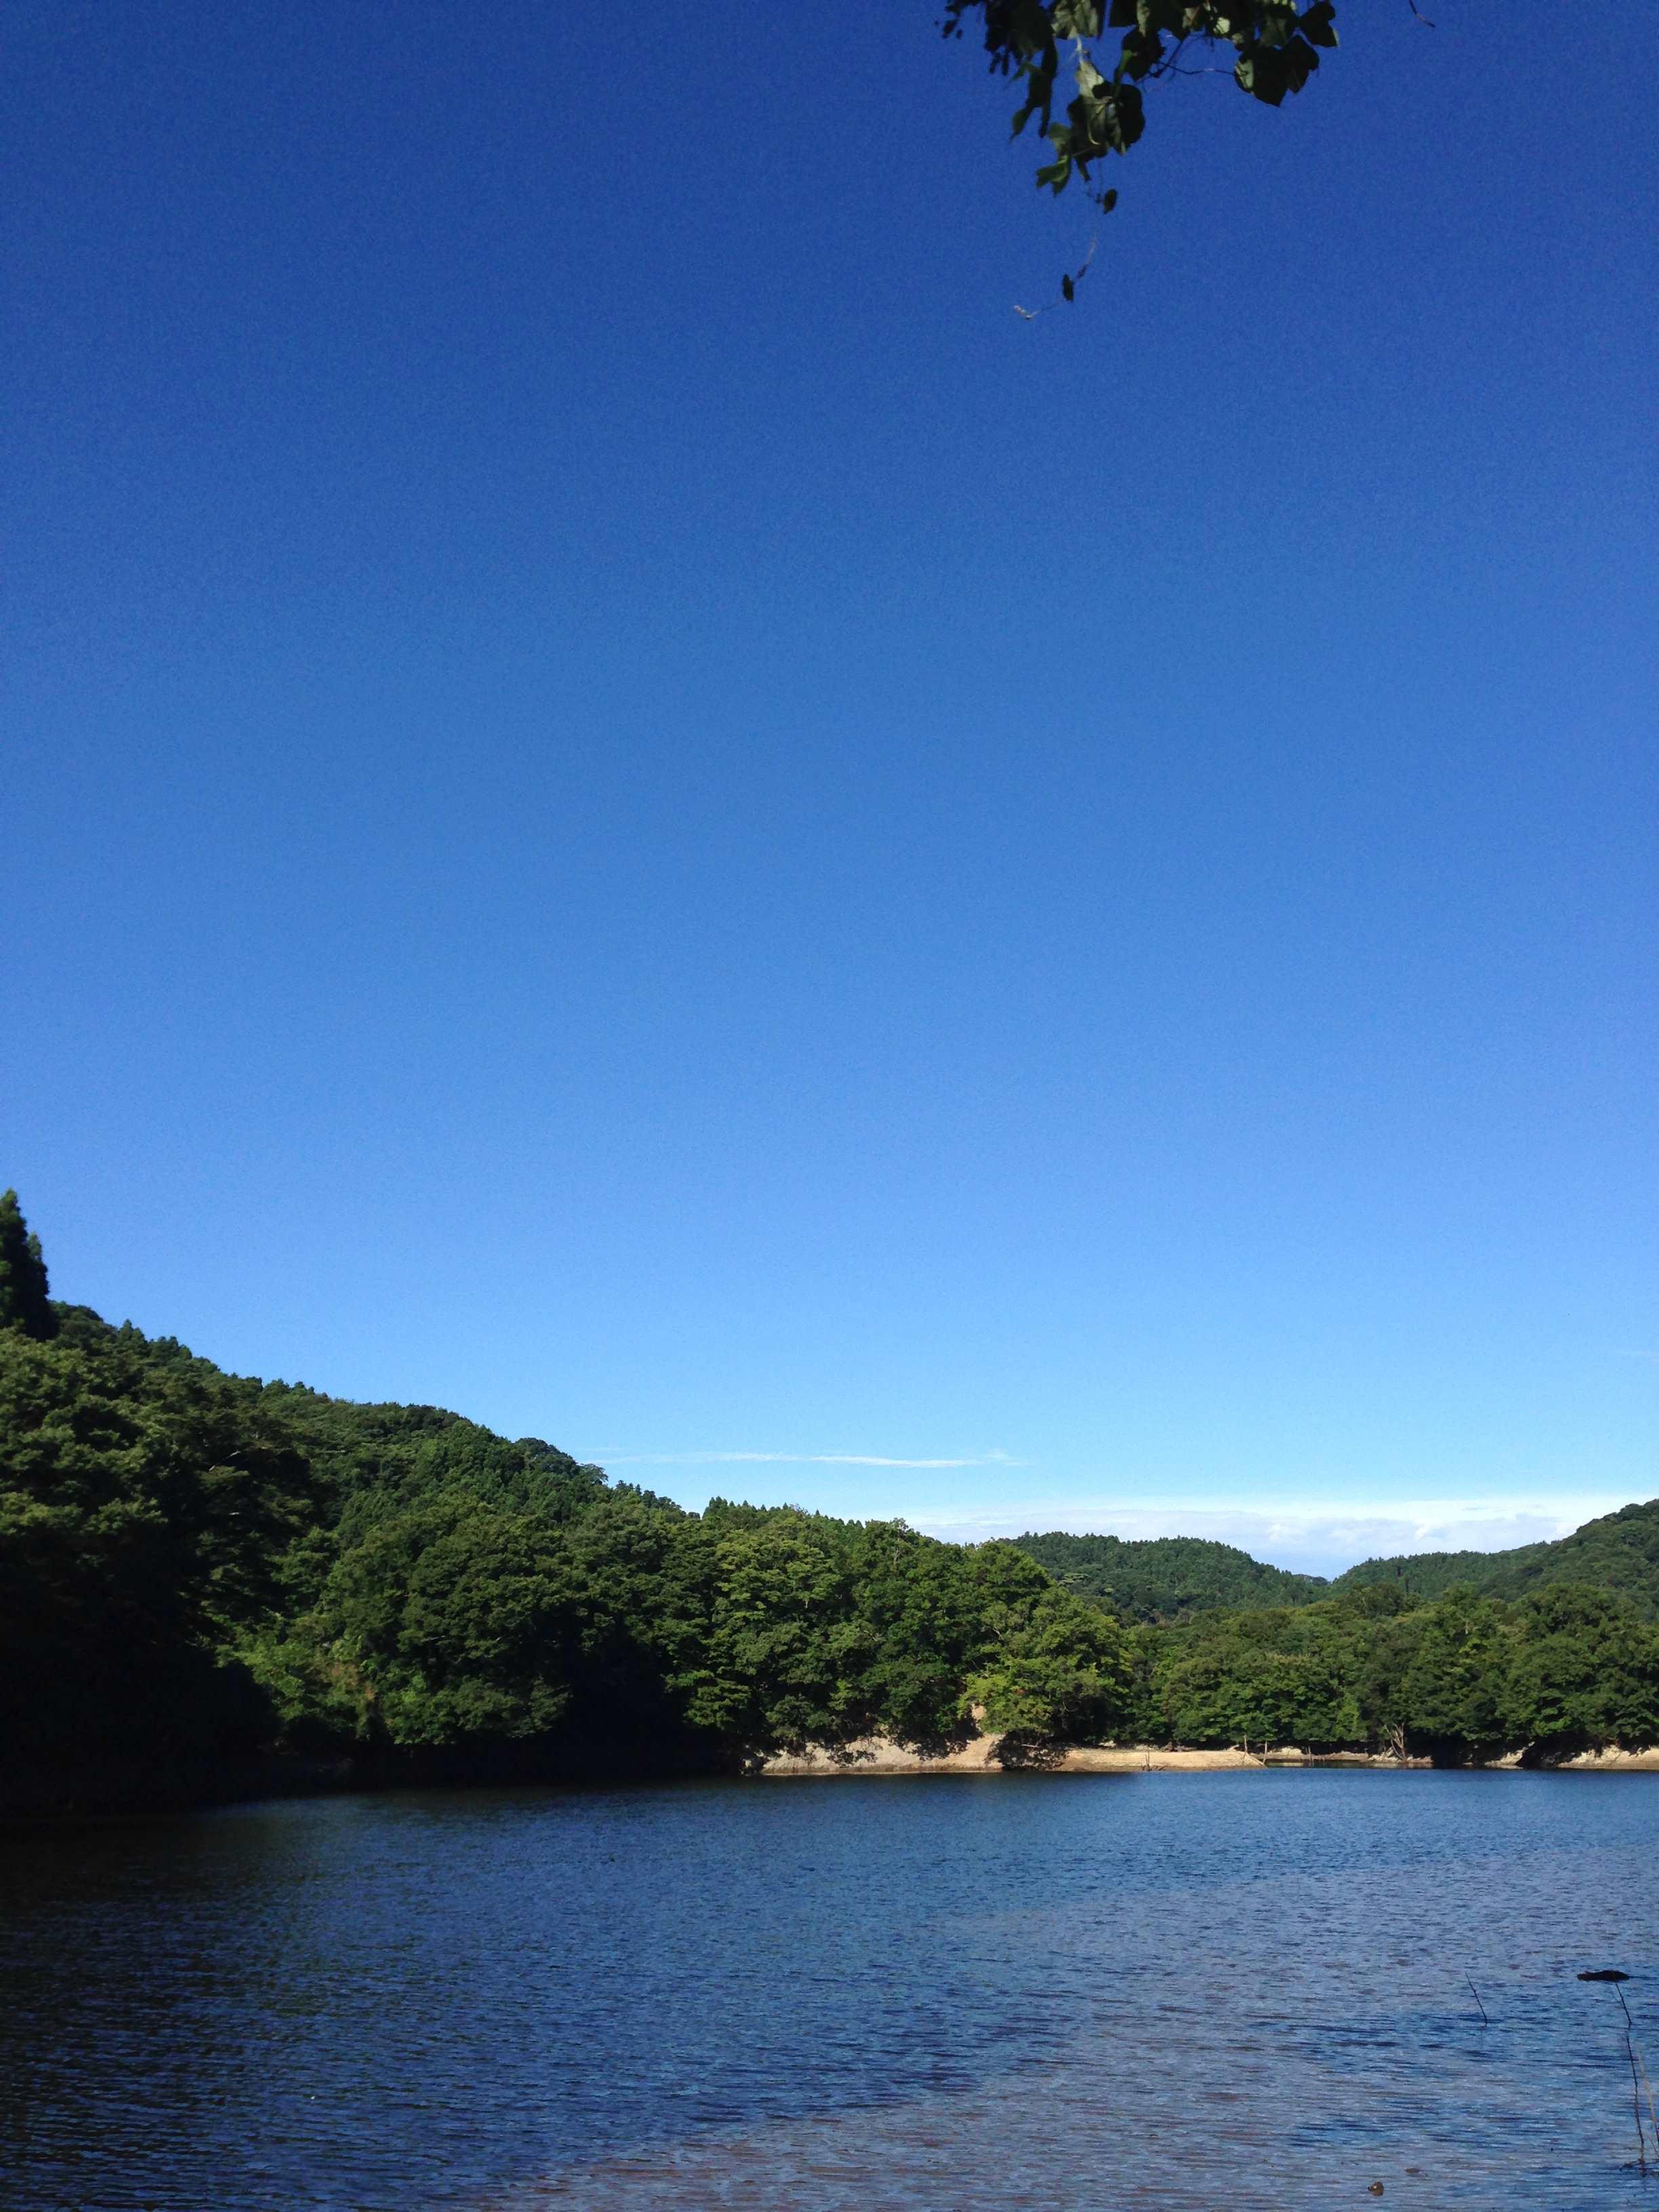 2014-08-03 07.39.36_R.jpg